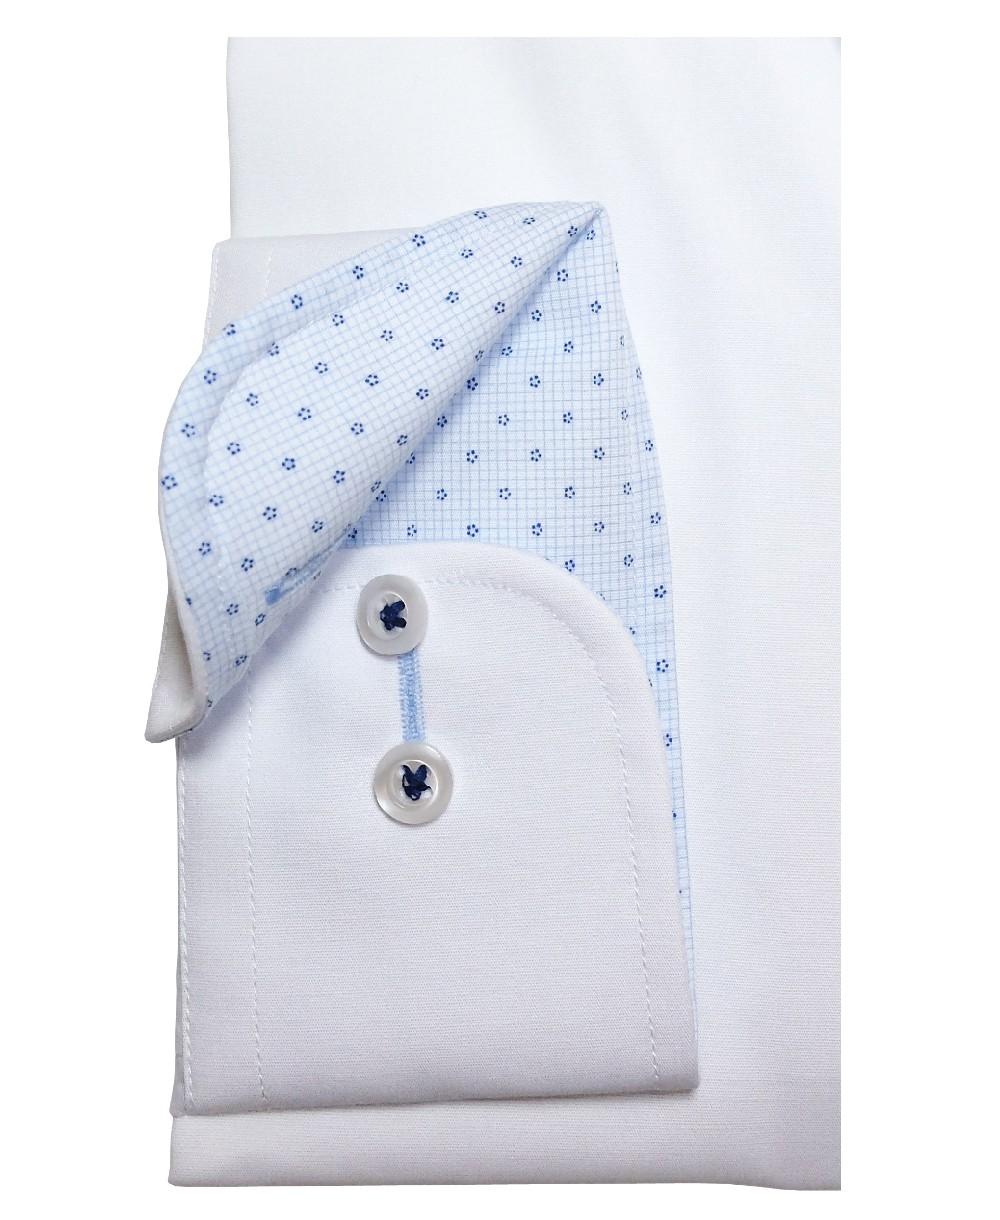 eterna Slim Fit Stretch weiss Patches in hellblau gemustert Langarmhemd 8581 00 F142